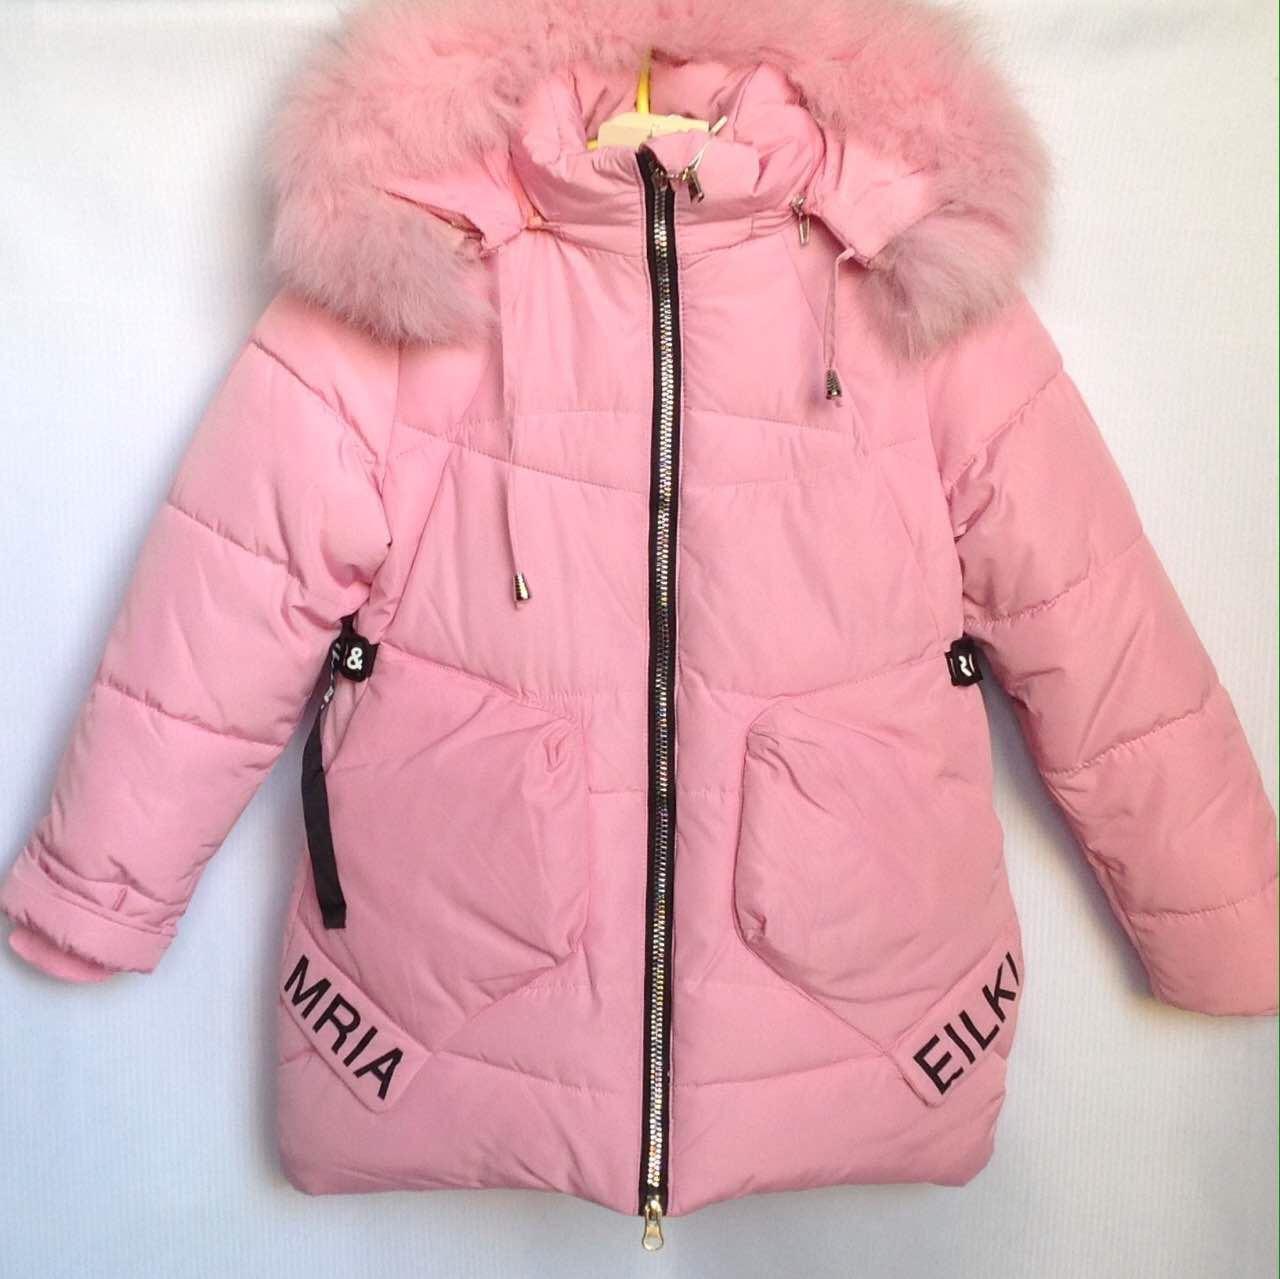 Куртка дитяча зимова оптом 128-152 рожева - Товари - Дитячий одяг ... 8610c05f8f7f9